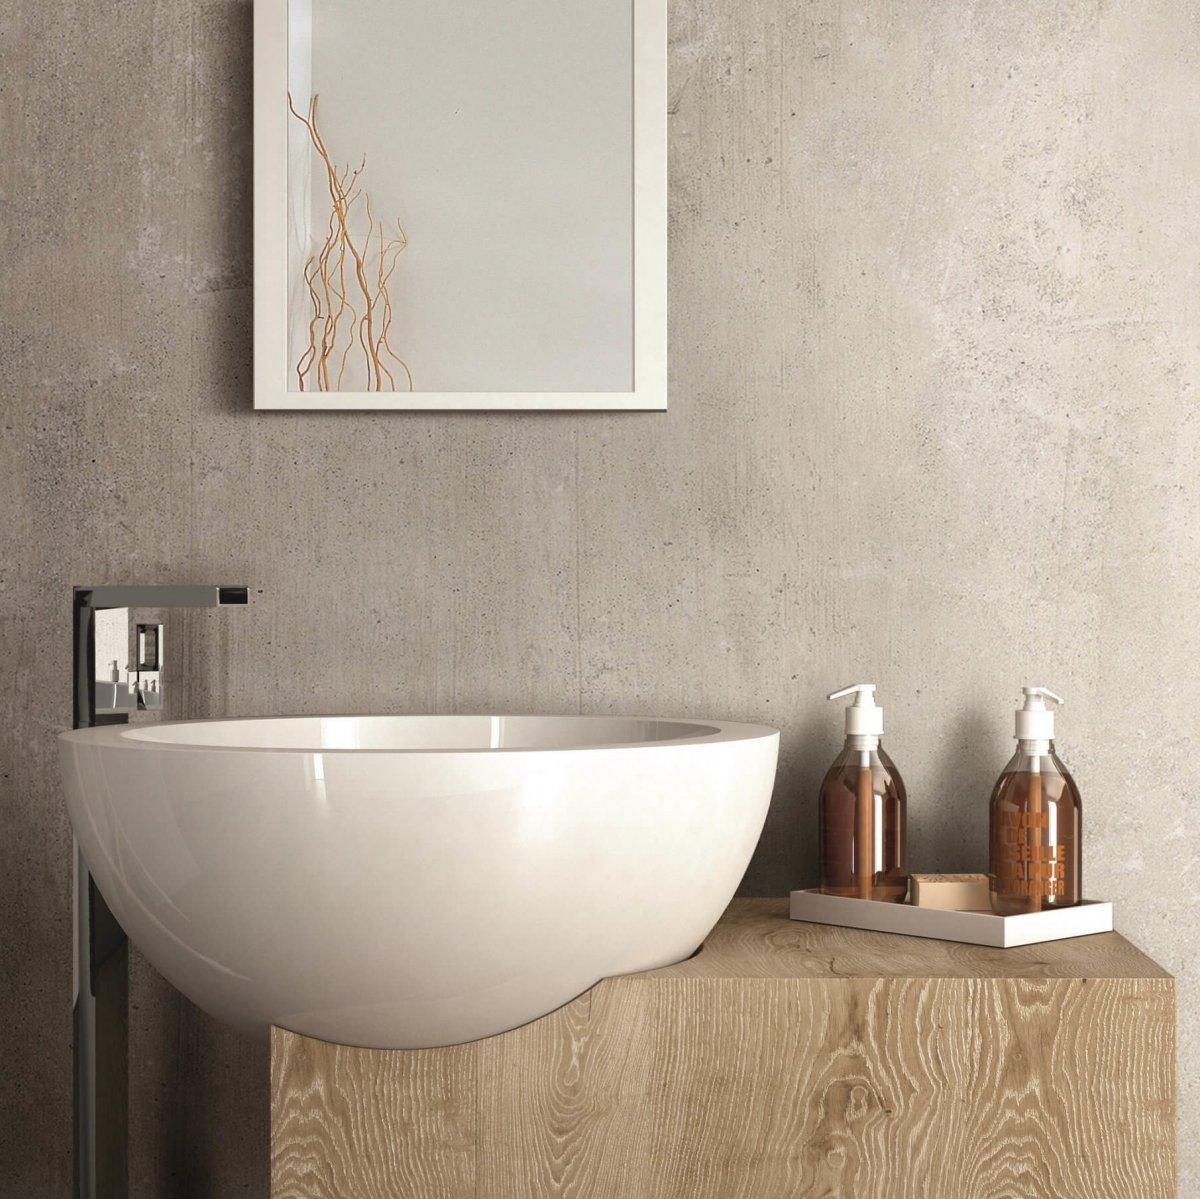 Florim Beton One Chalk 600x600mm_Stiles_Lifestyle_Image3